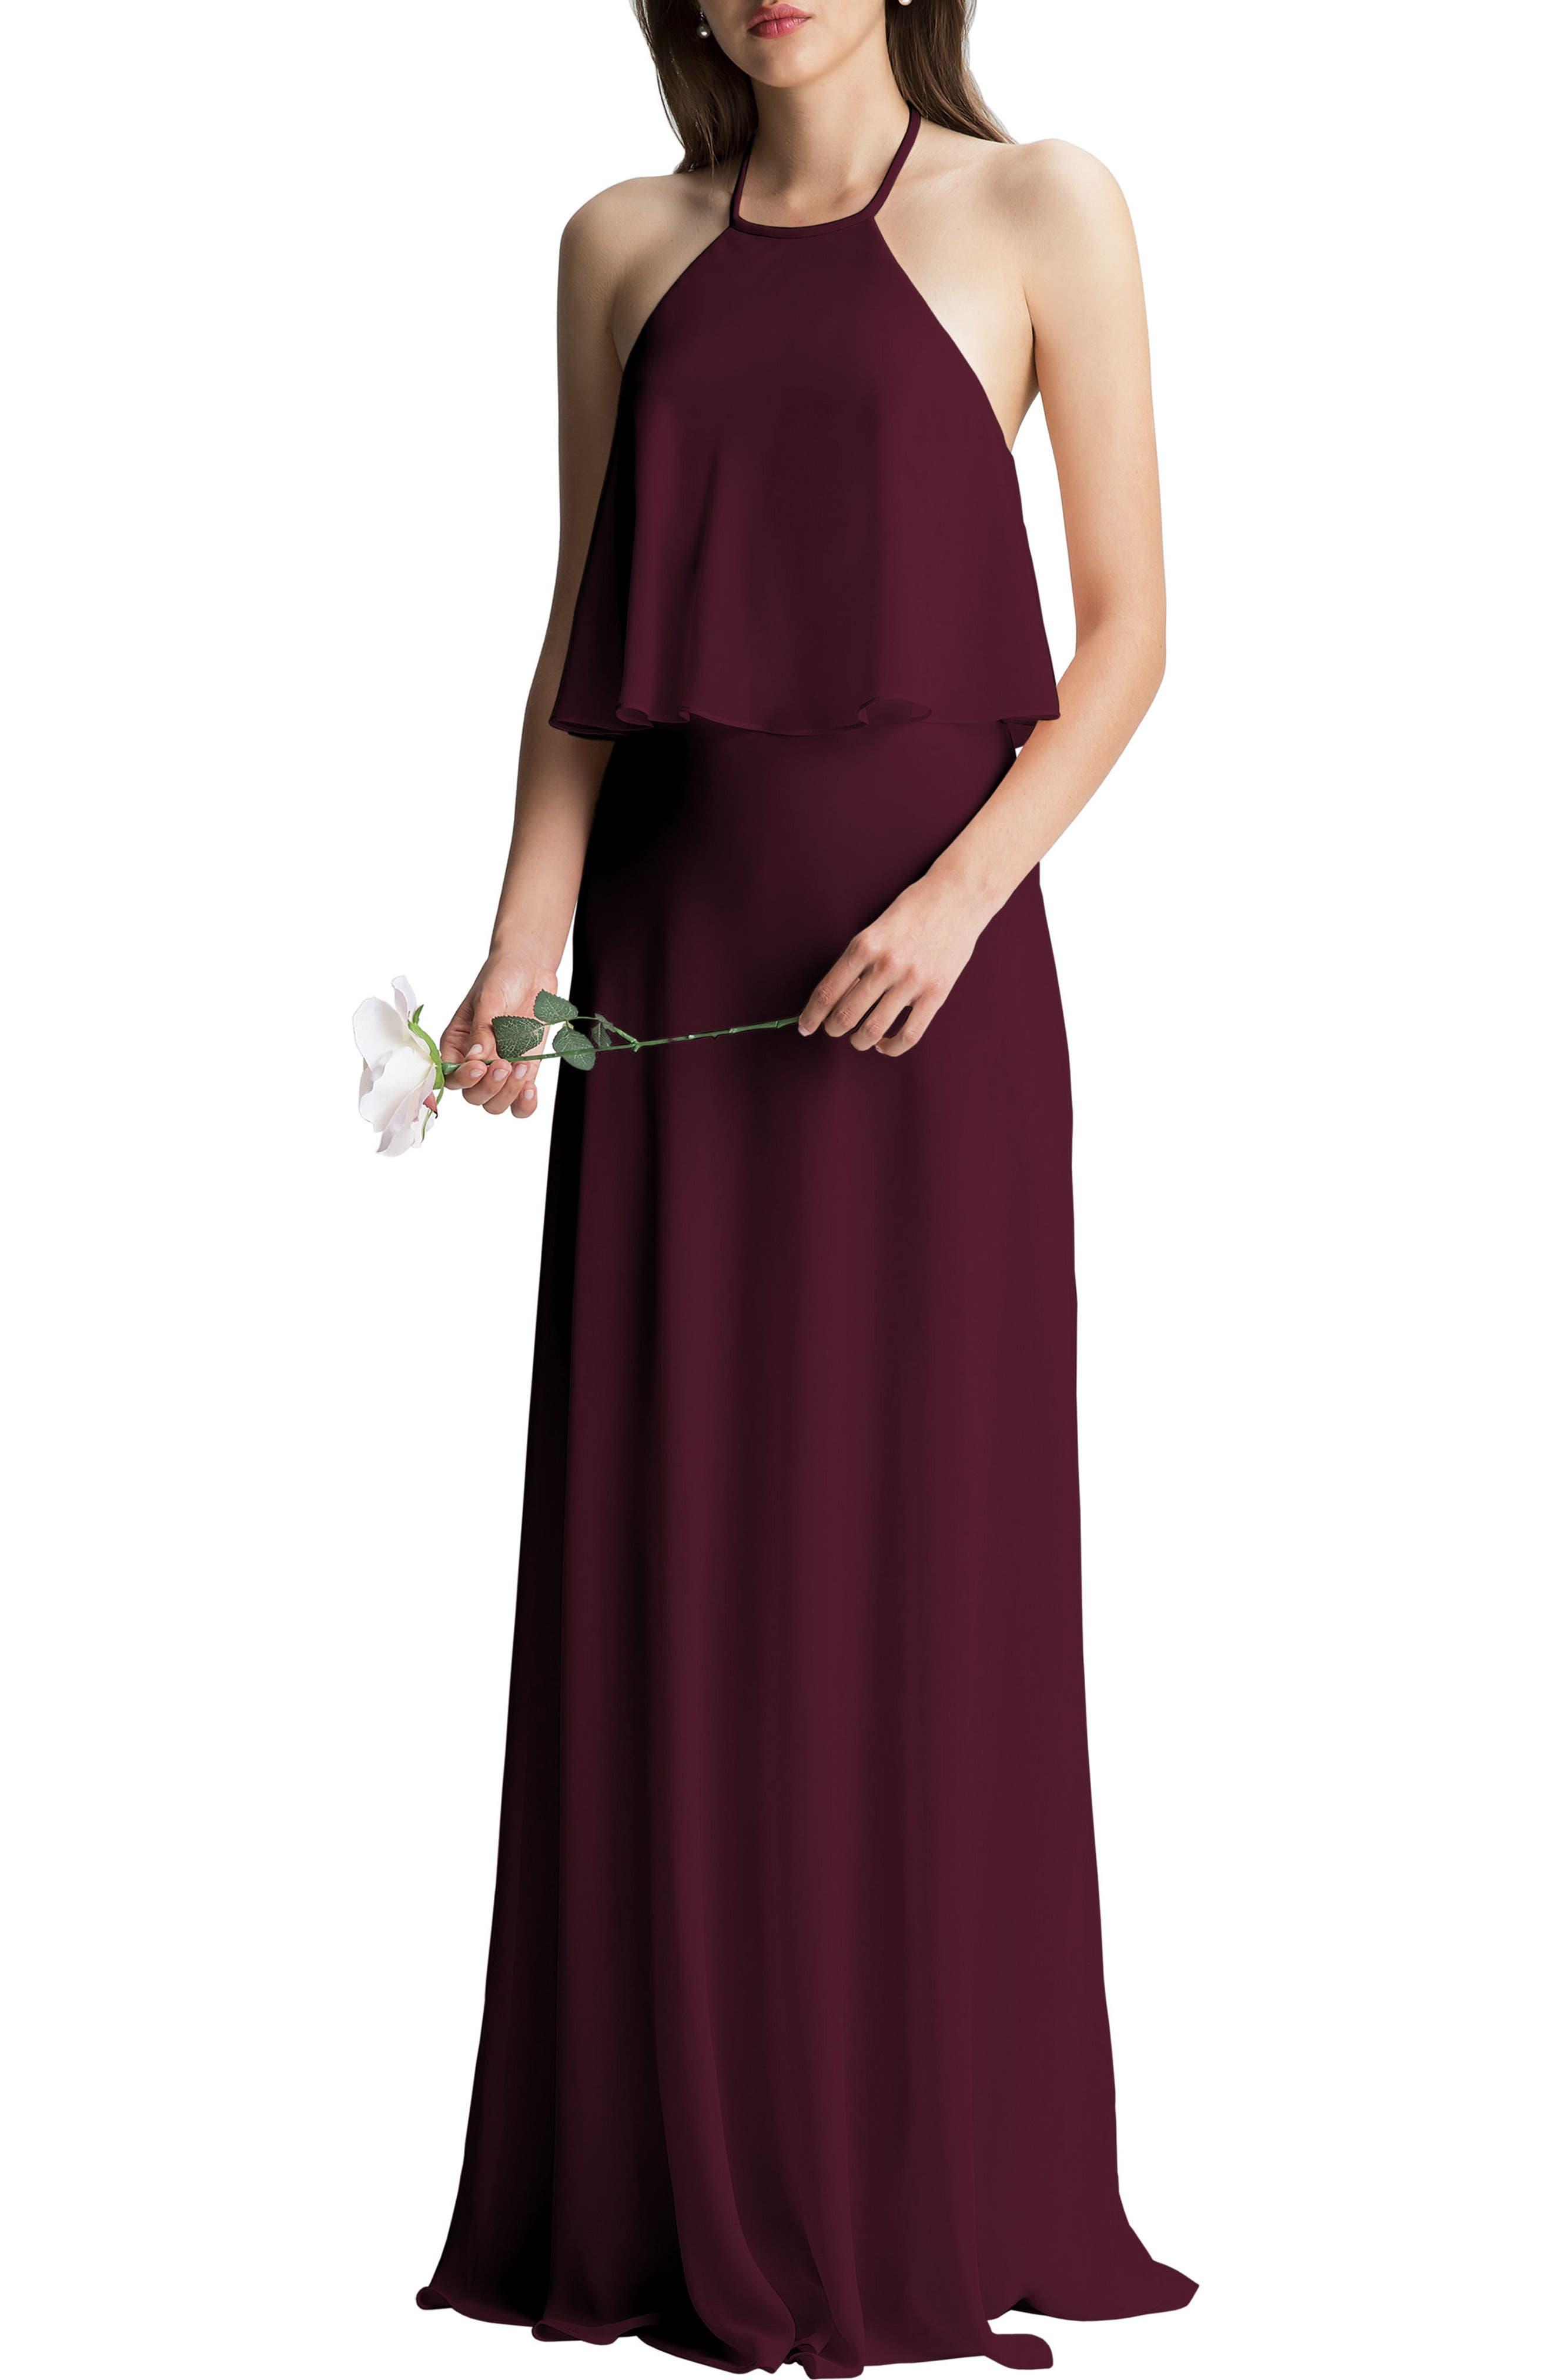 Halter Overlay Chiffon Gown,                             Main thumbnail 1, color,                             WINE